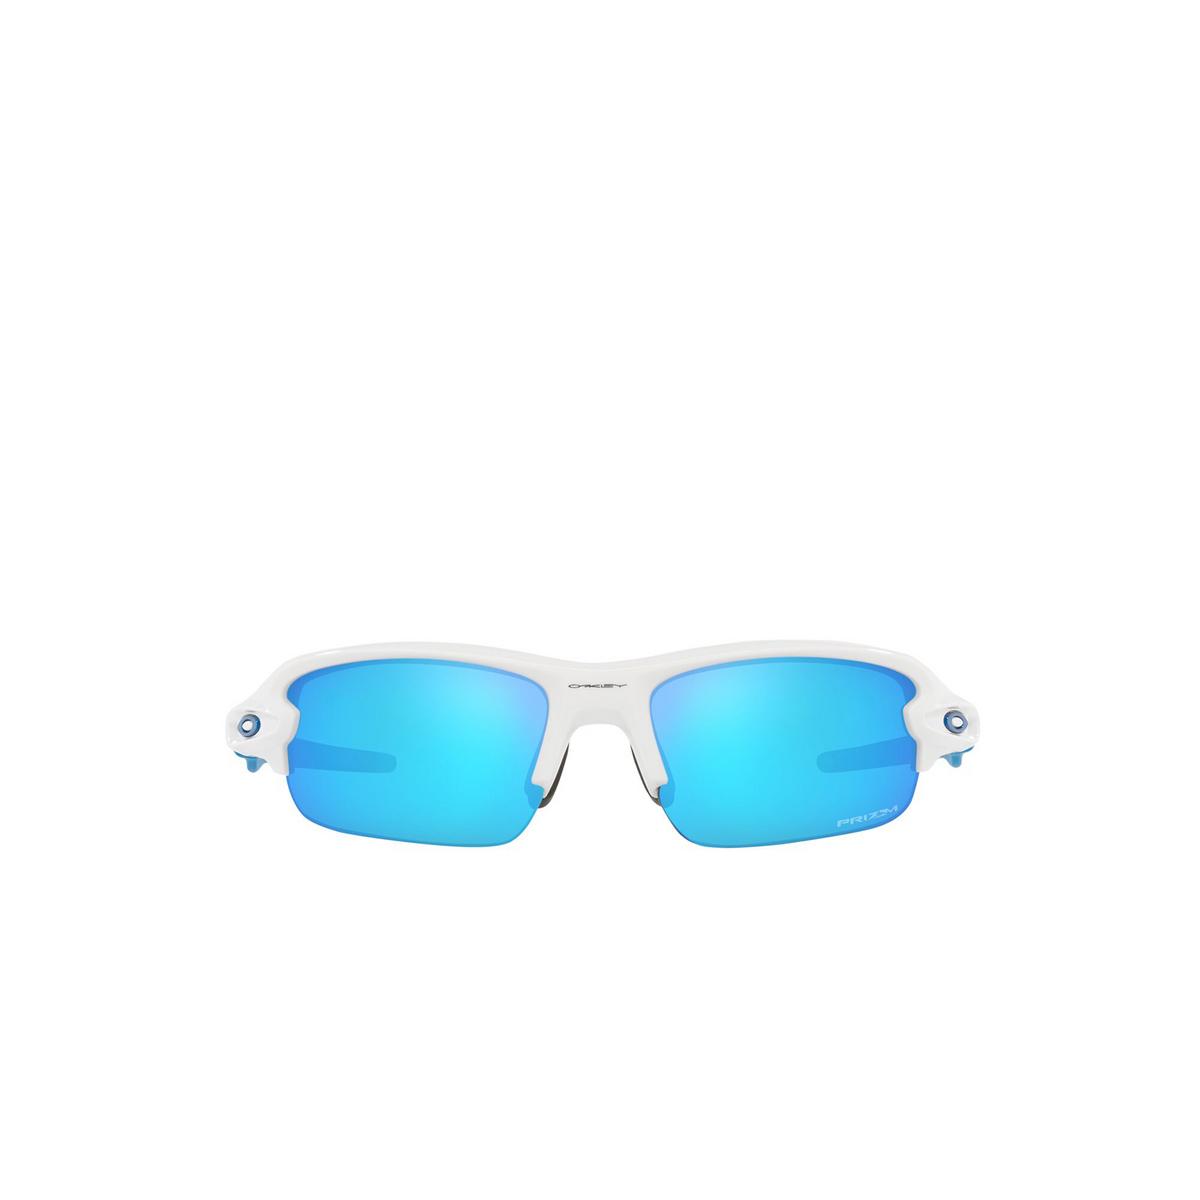 Oakley® Rectangle Sunglasses: Flak Xxs OJ9008 color Polished White 900806 - front view.